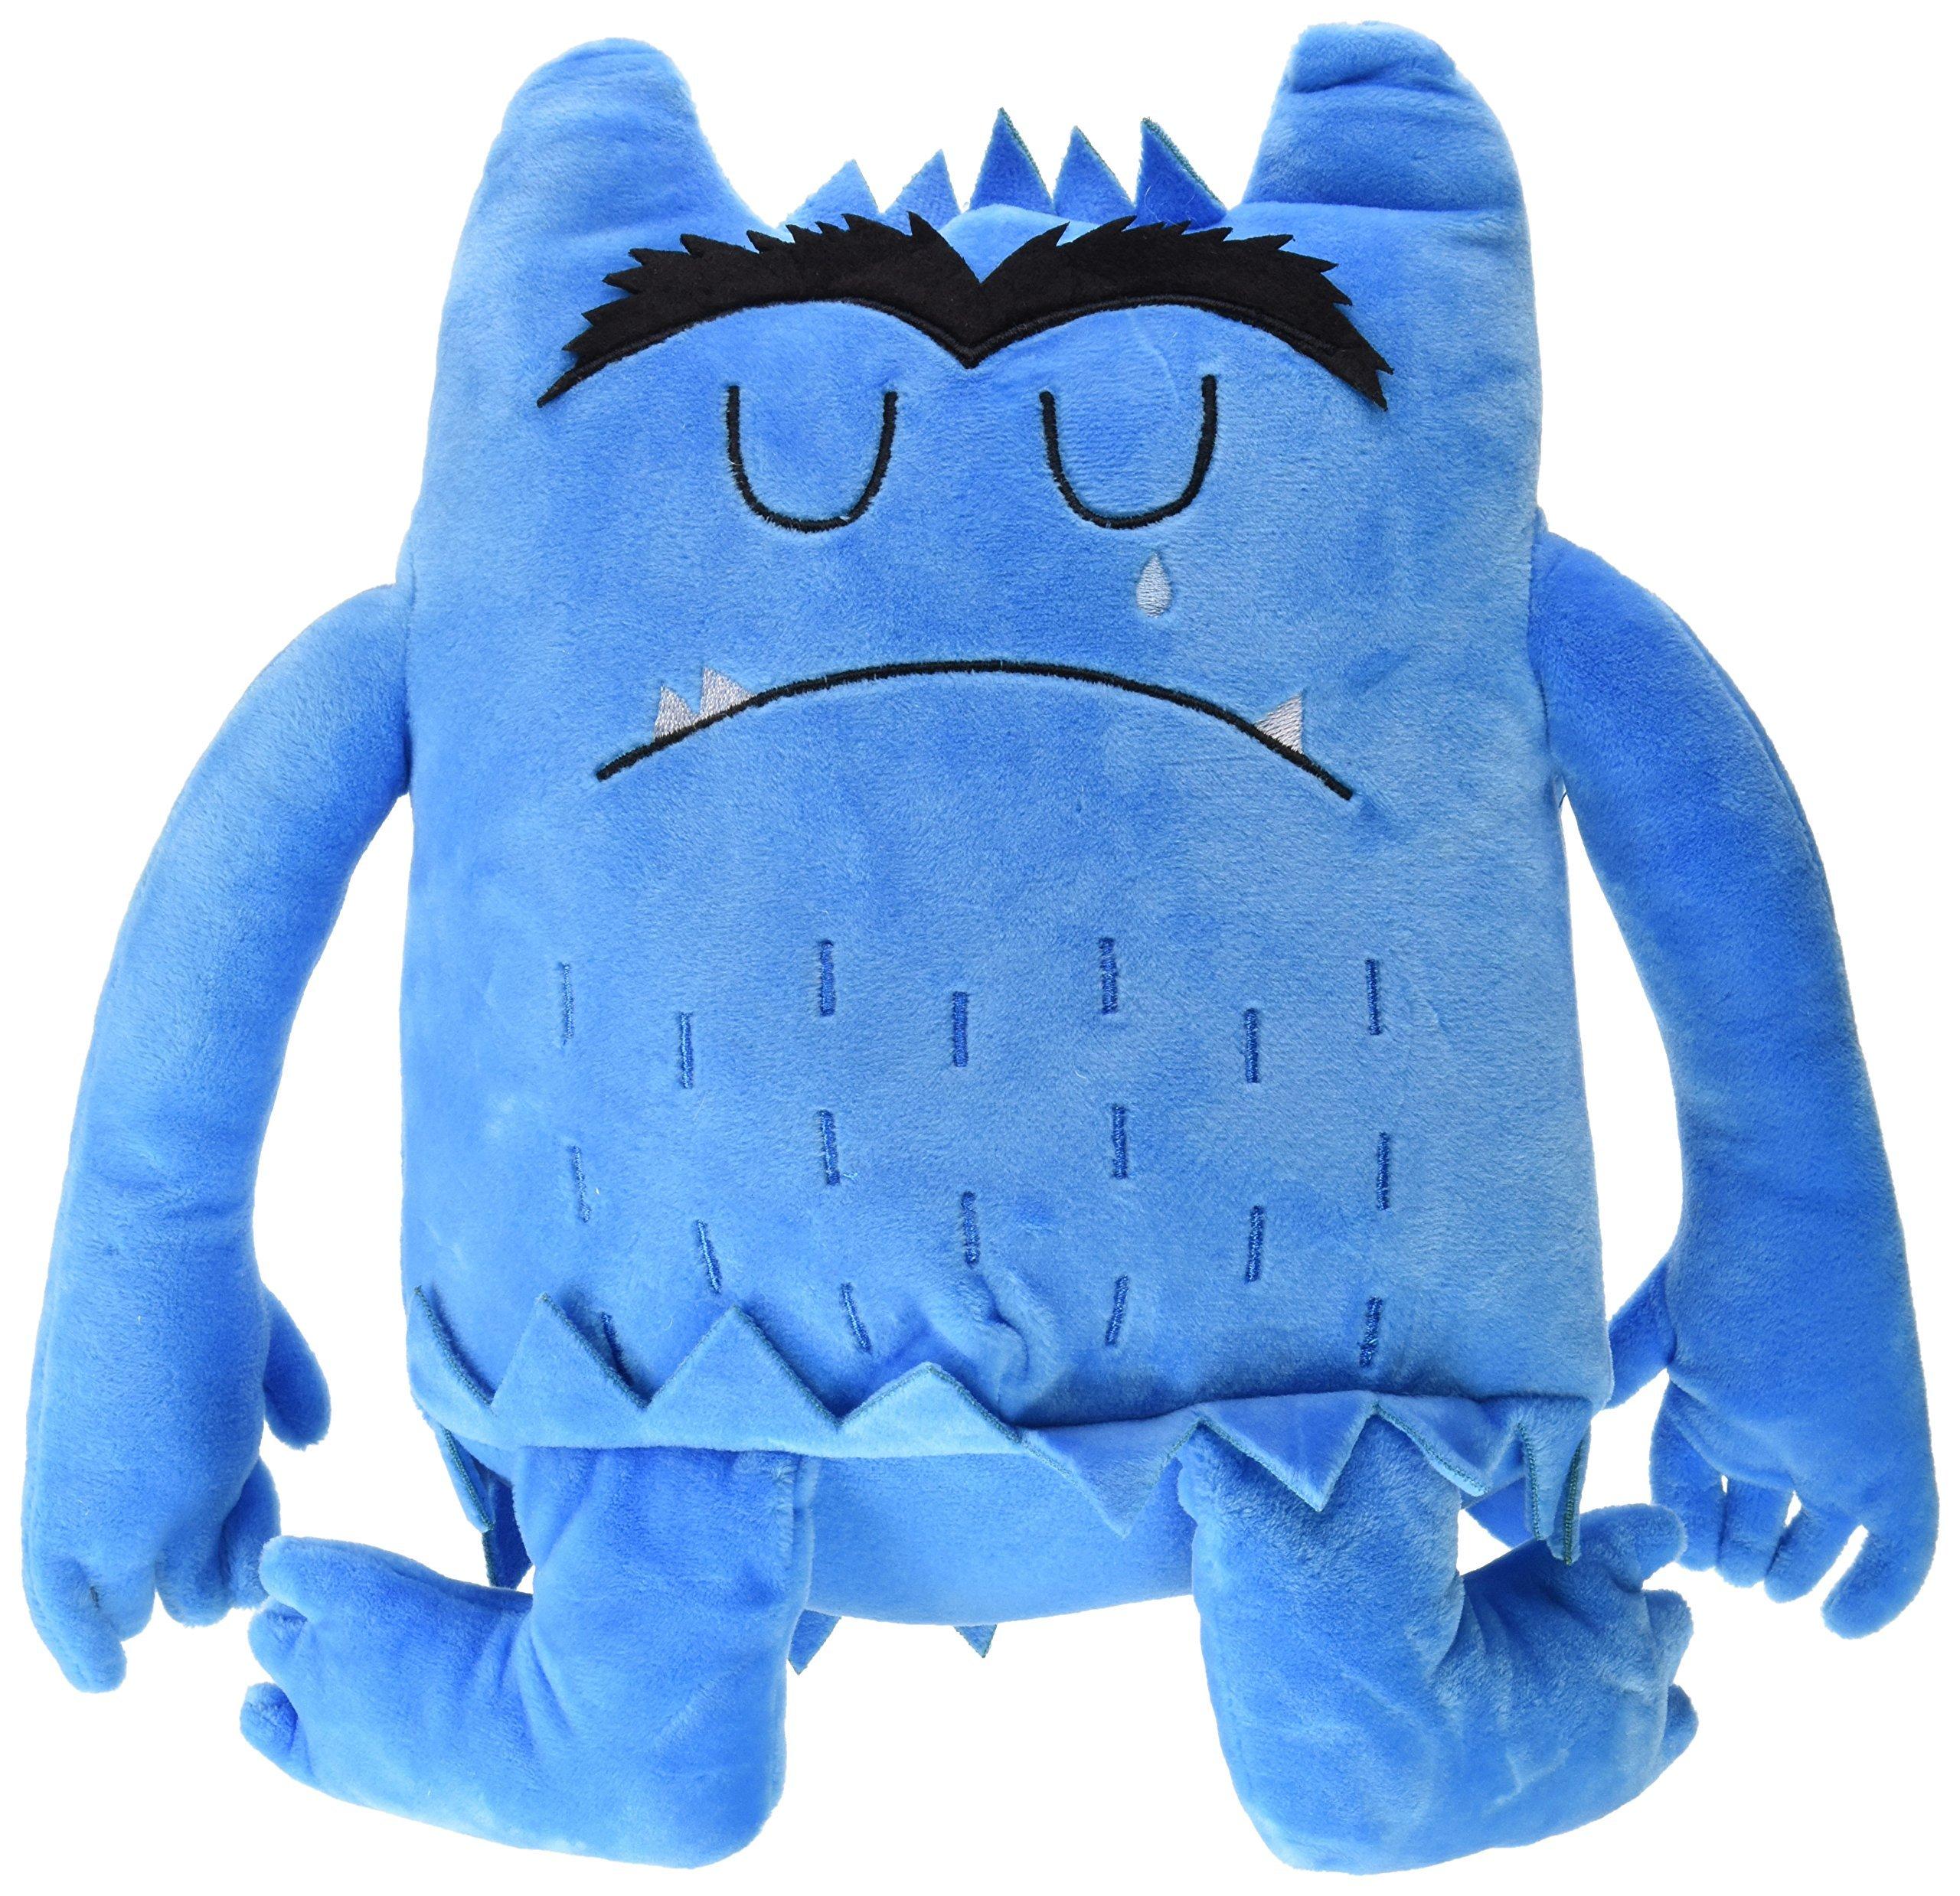 Monstruo De Colores Peluche Azul Tapa blanda – 2017 MADE S.L. B01HYFS7KS